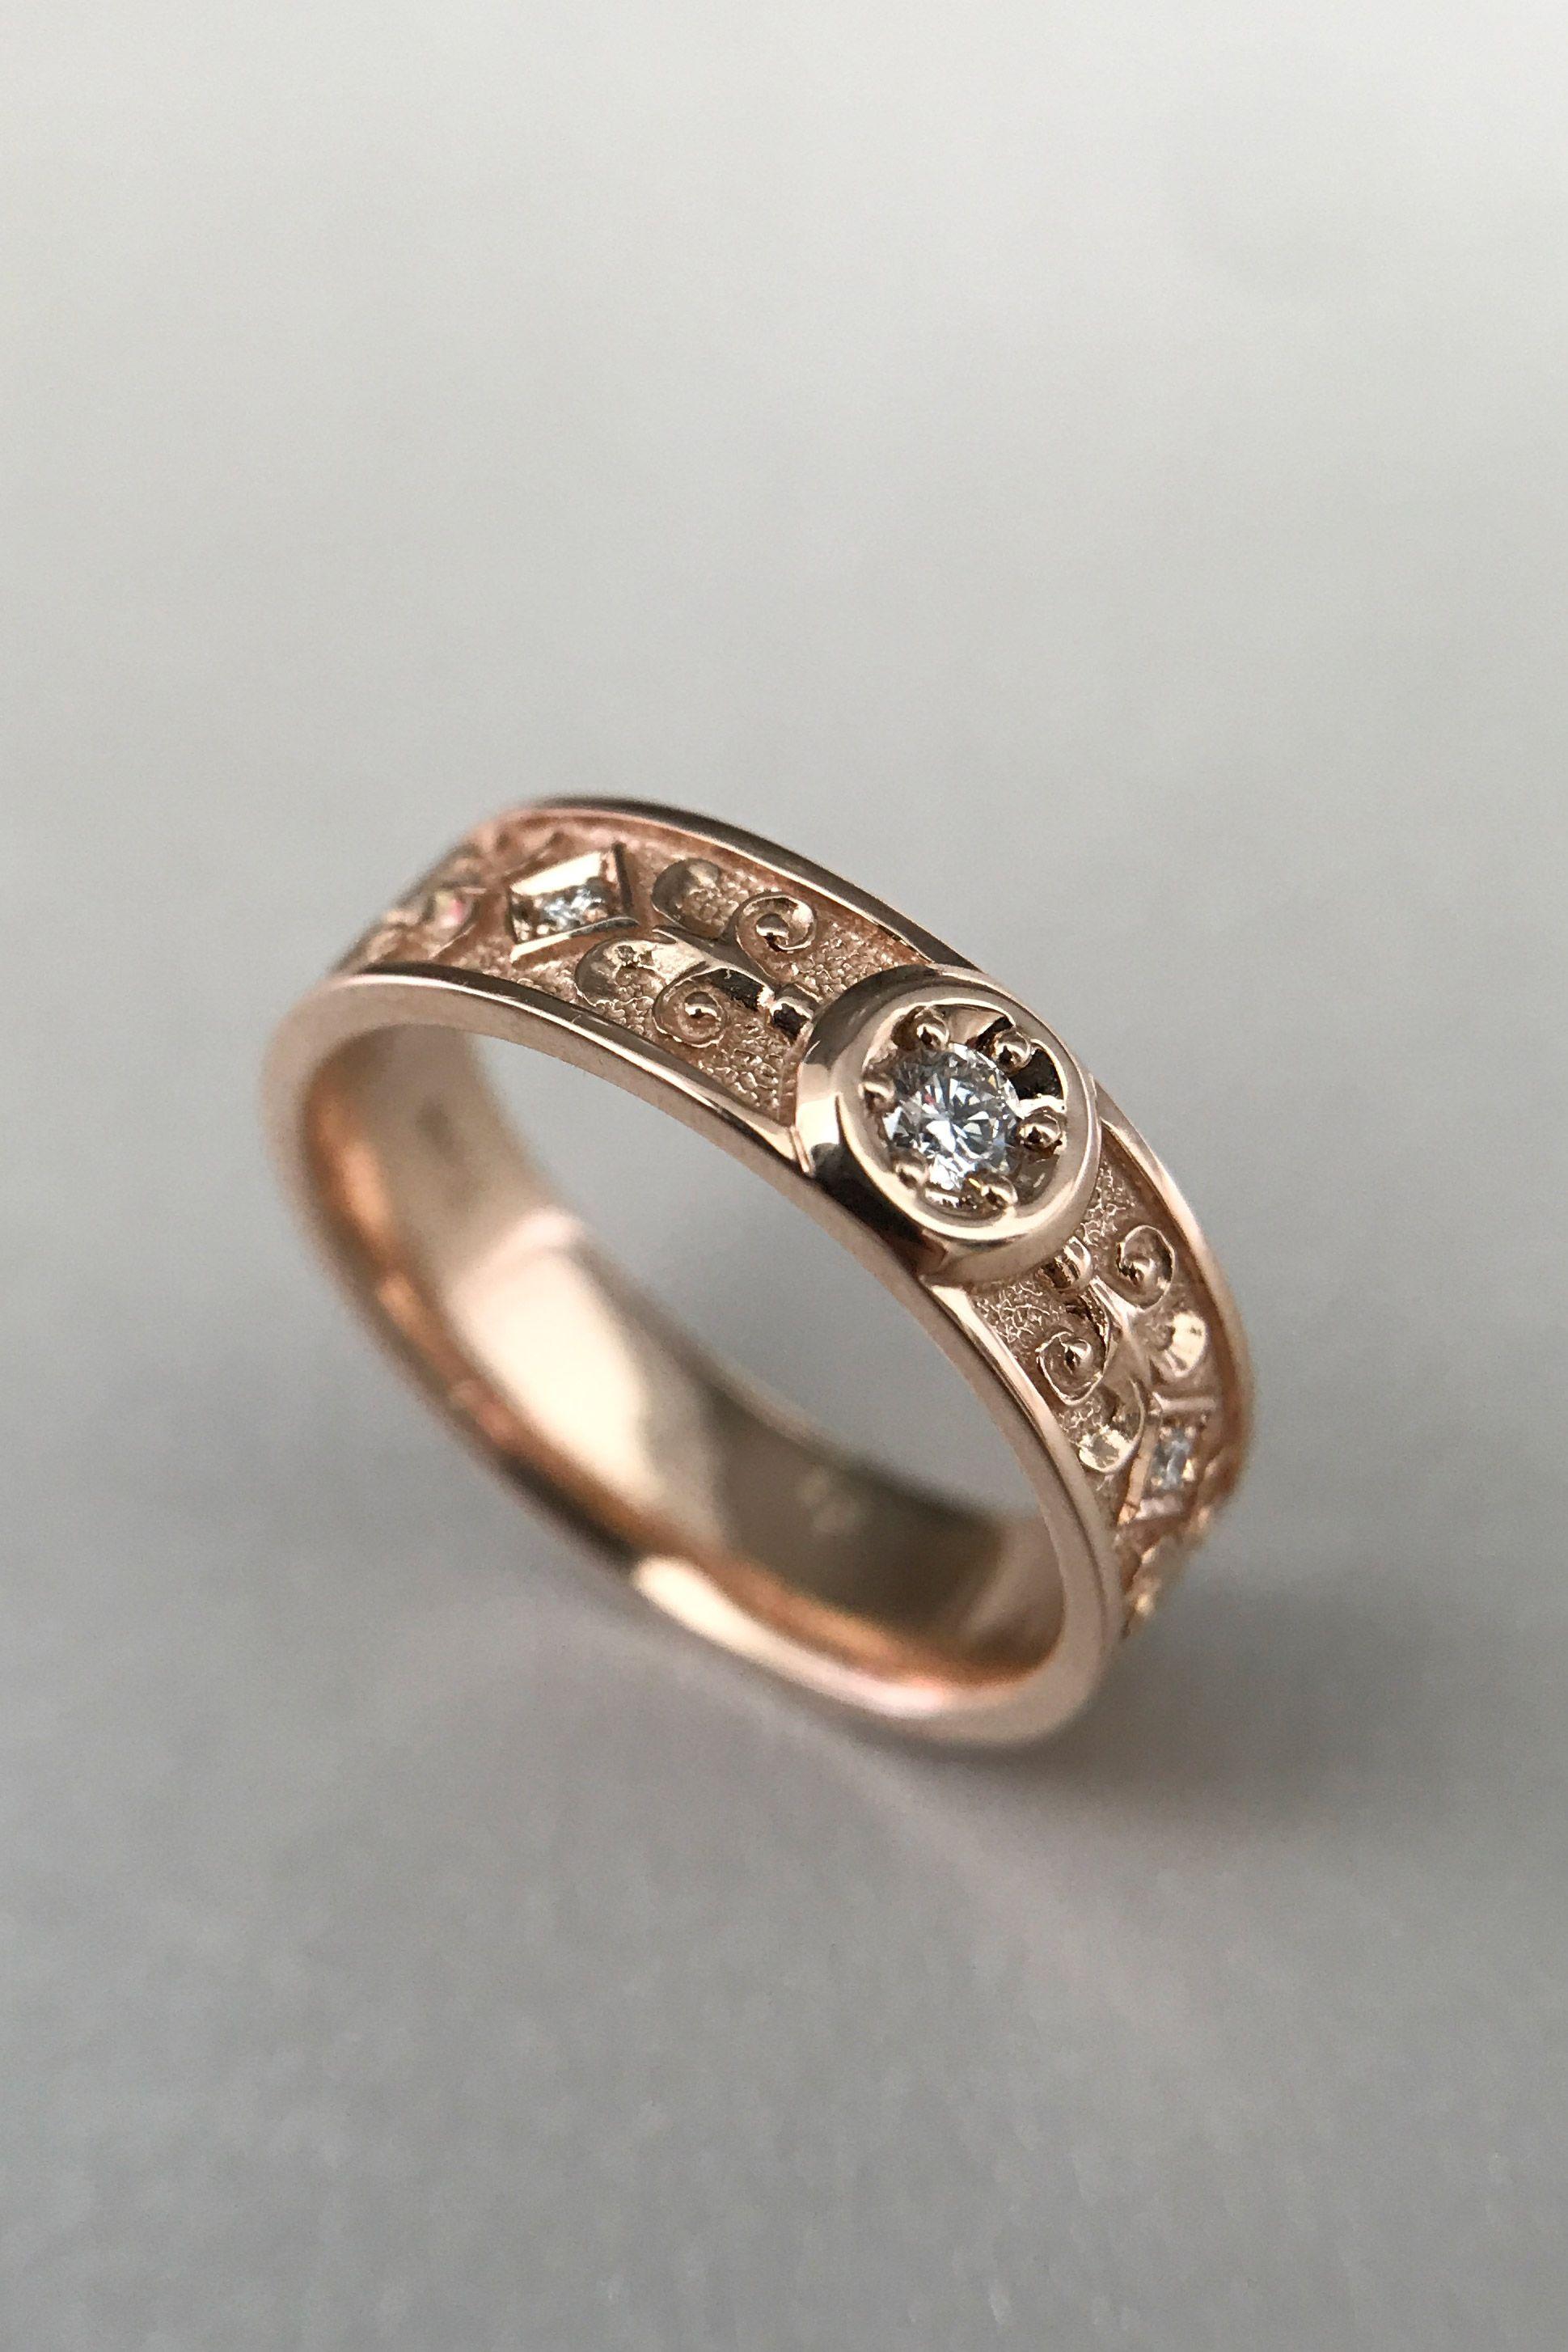 Celtic Wedding Rings Antique Wedding Band Wedding Ring Set Etsy Antique Wedding Rings Antique Wedding Bands Celtic Wedding Ring Sets